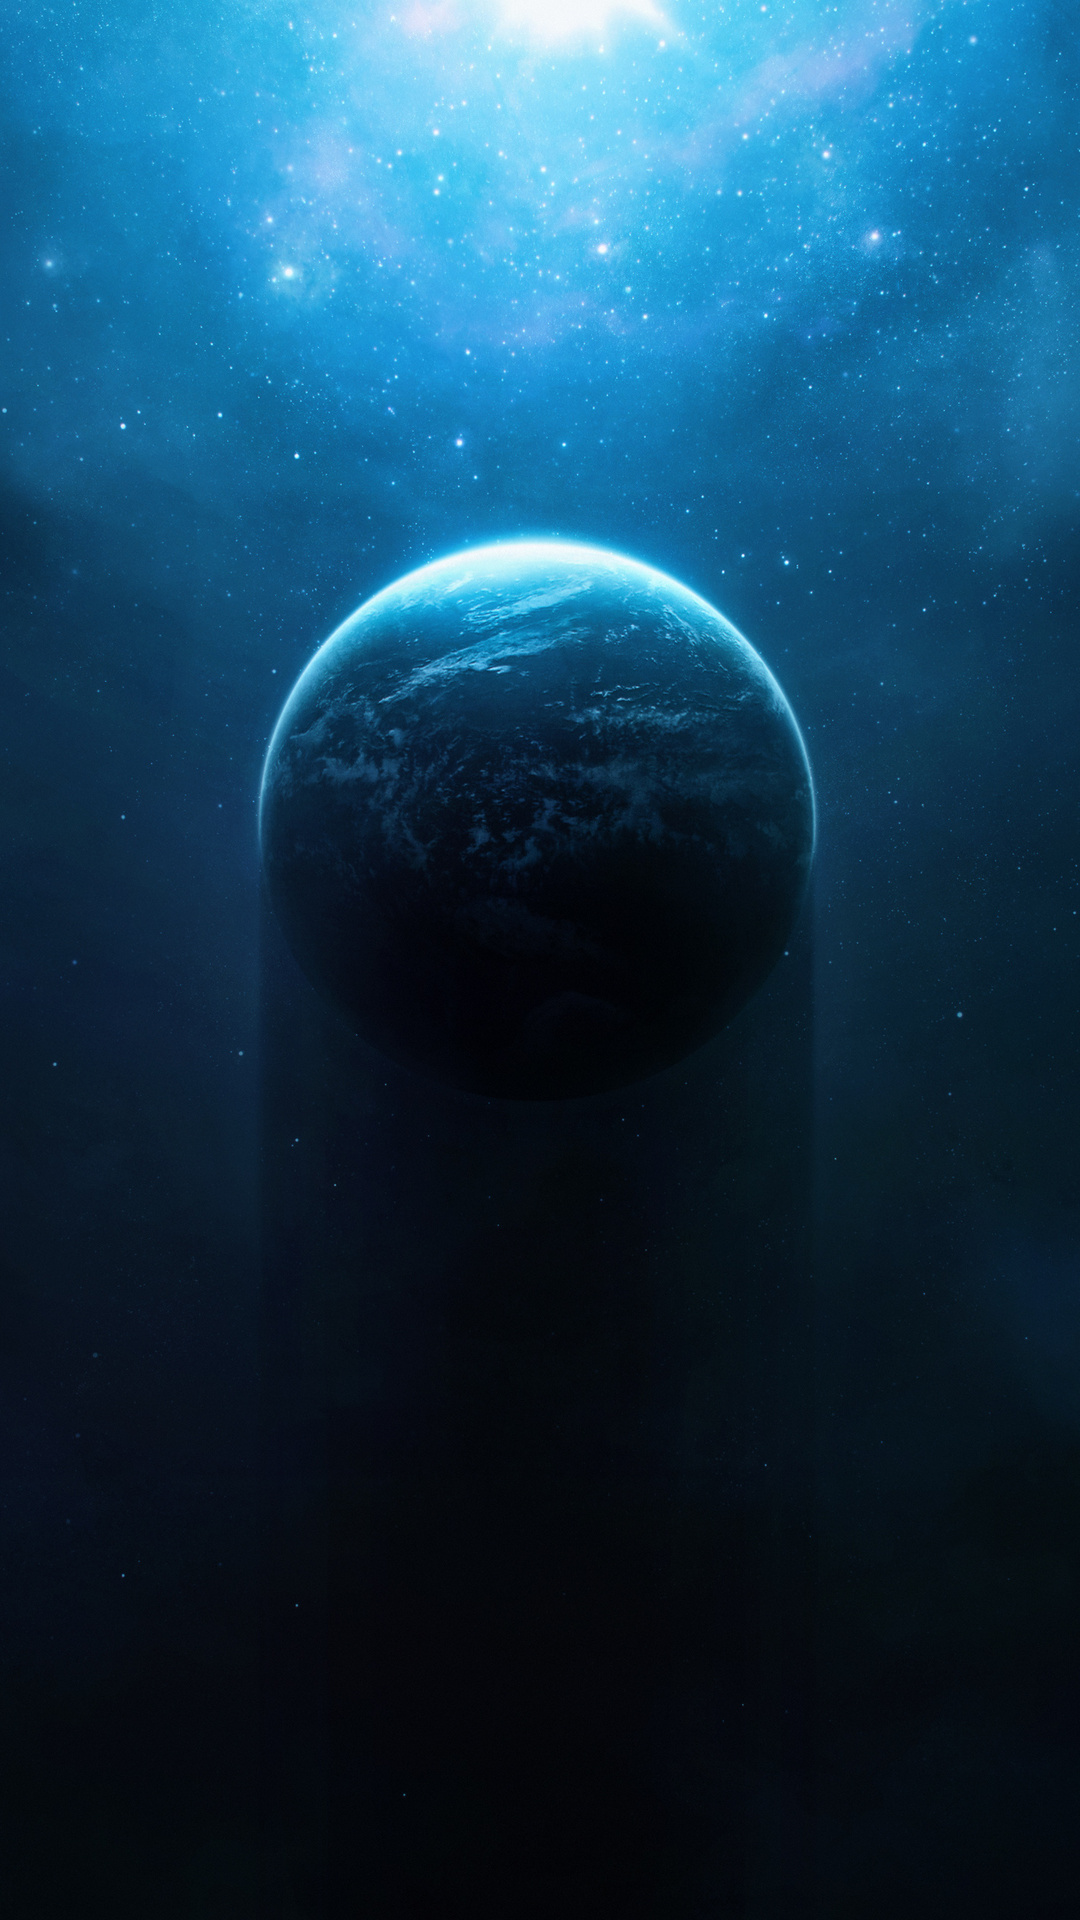 nebula-halo-planet-digital-space-art-7t.jpg